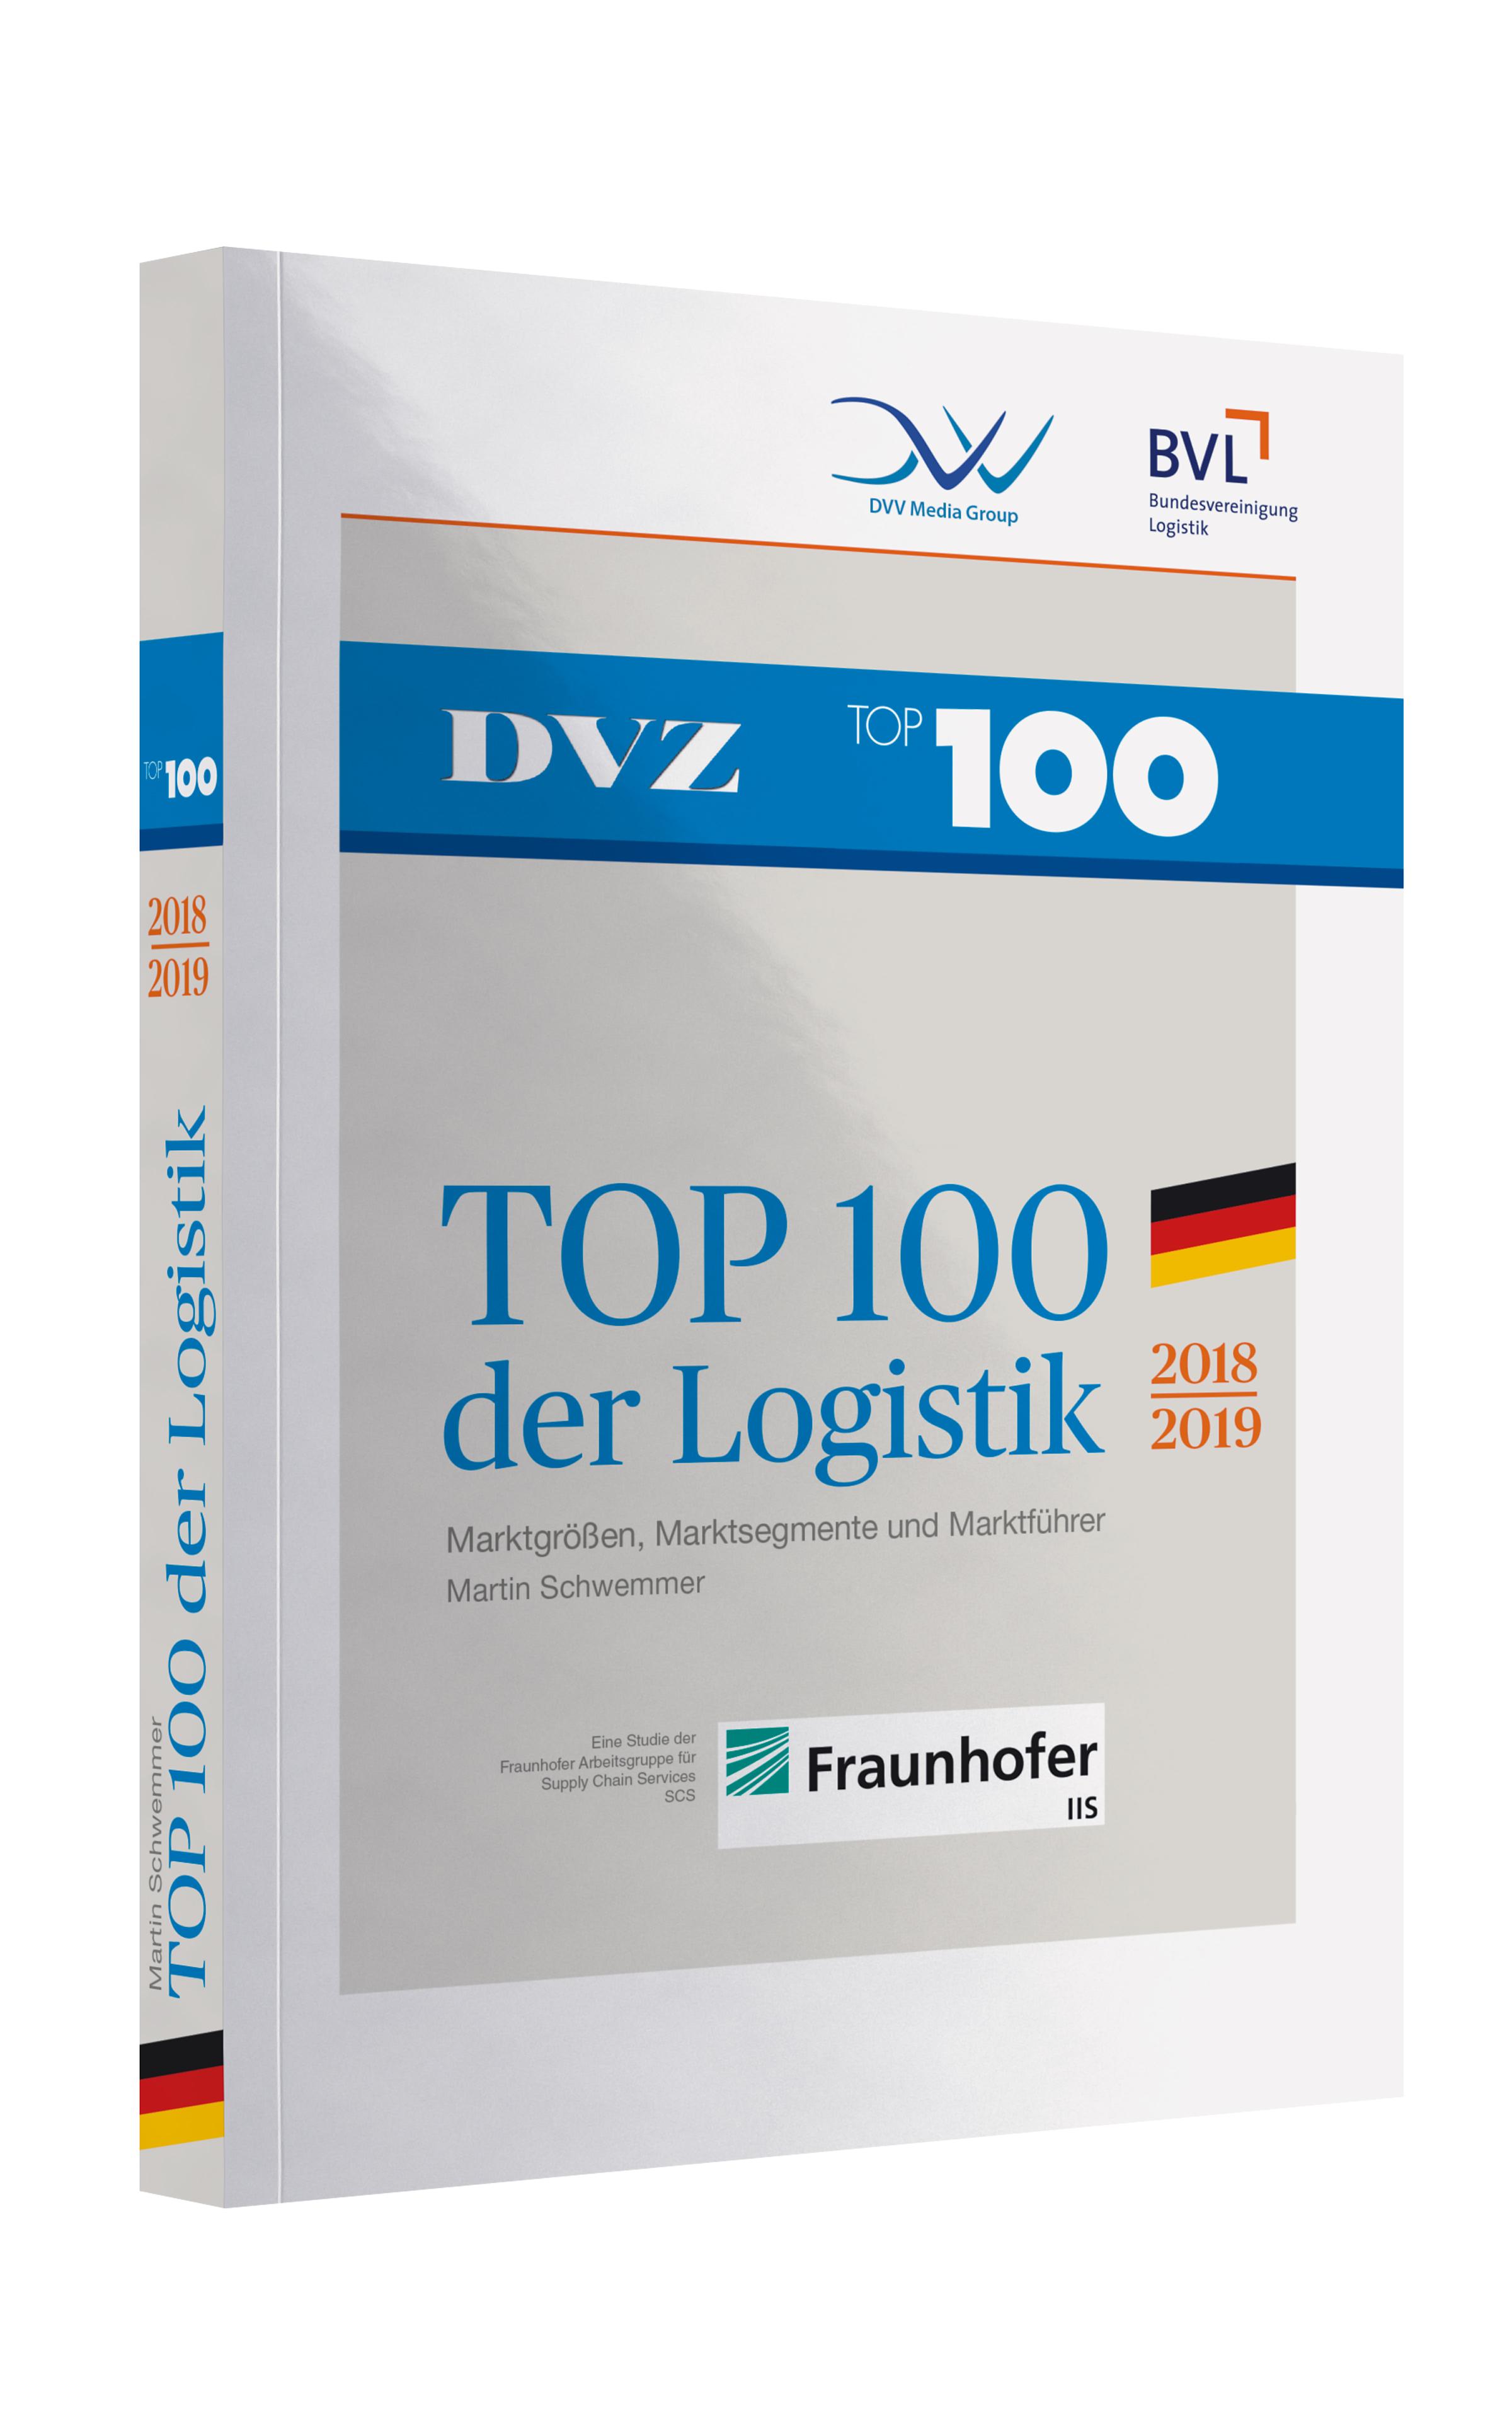 TOP 100 der Logistik 2018/2019